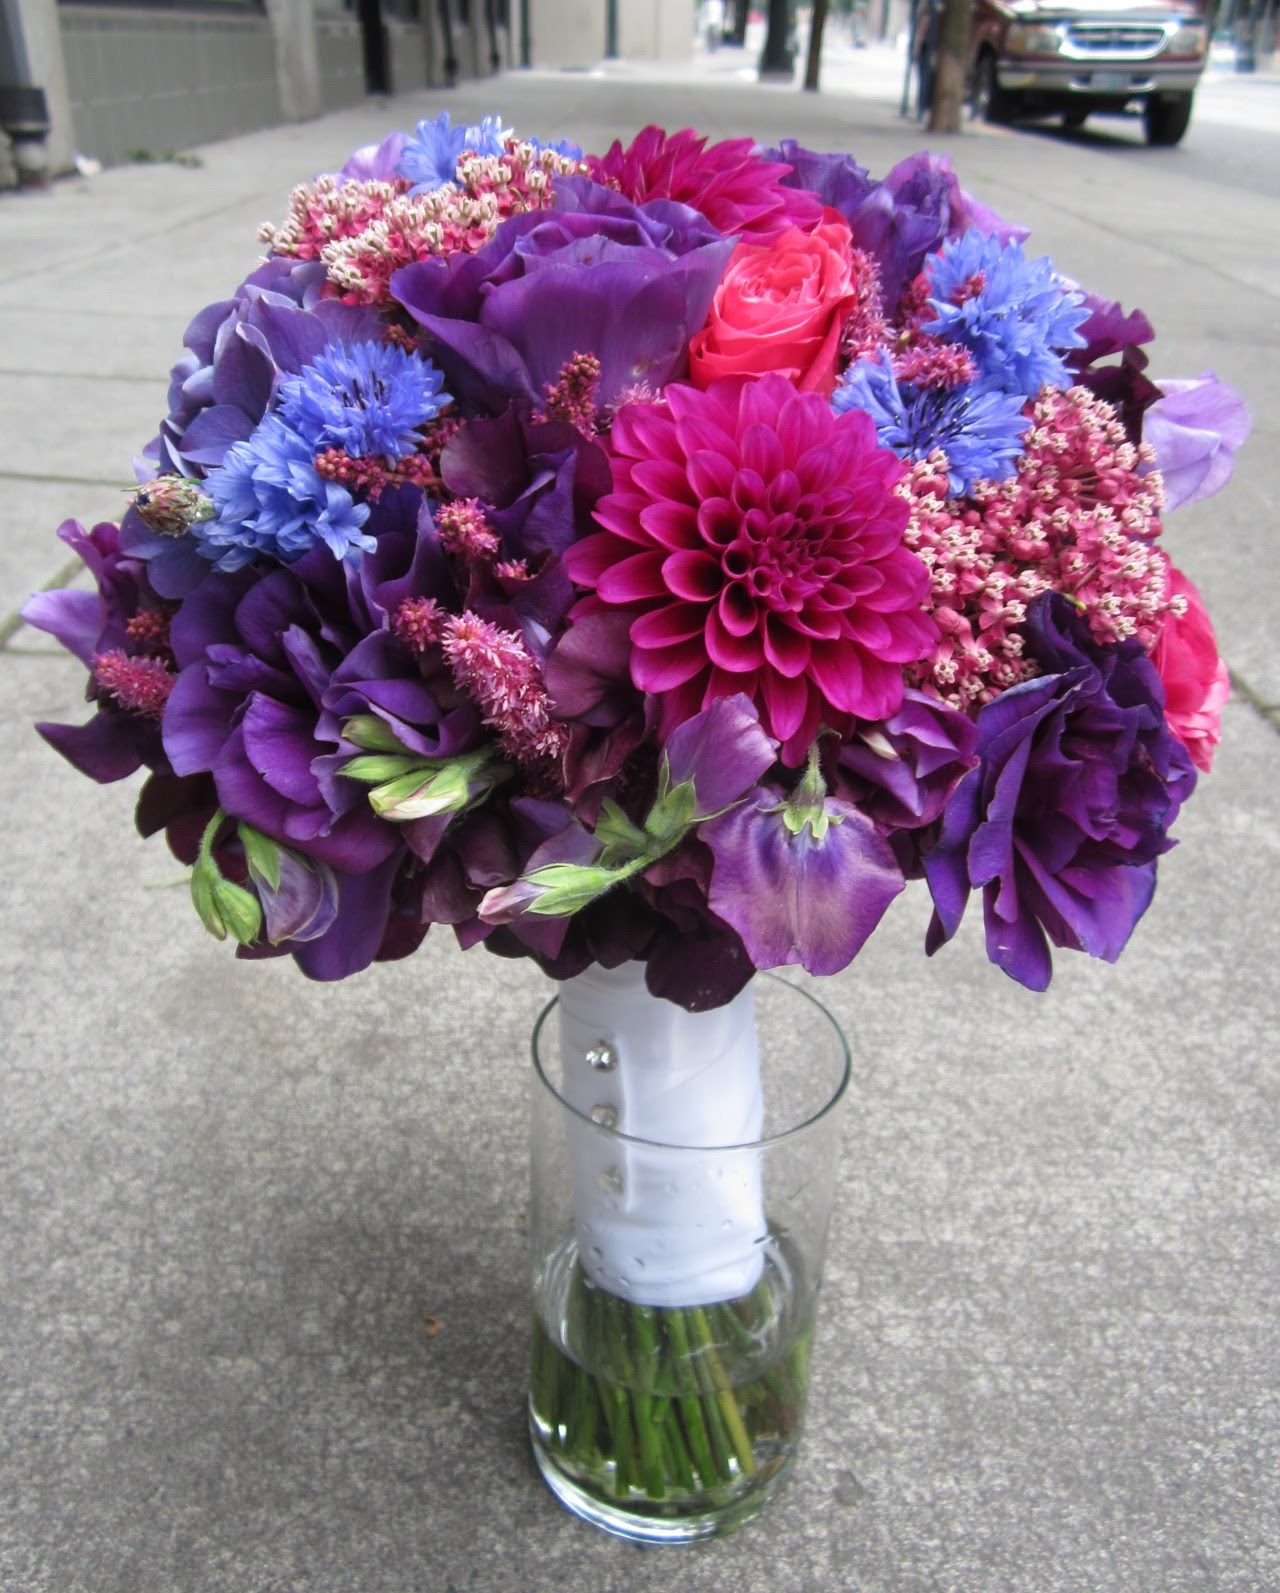 Sammys flowers wedding style purple bouquets wedding style purple bouquets izmirmasajfo